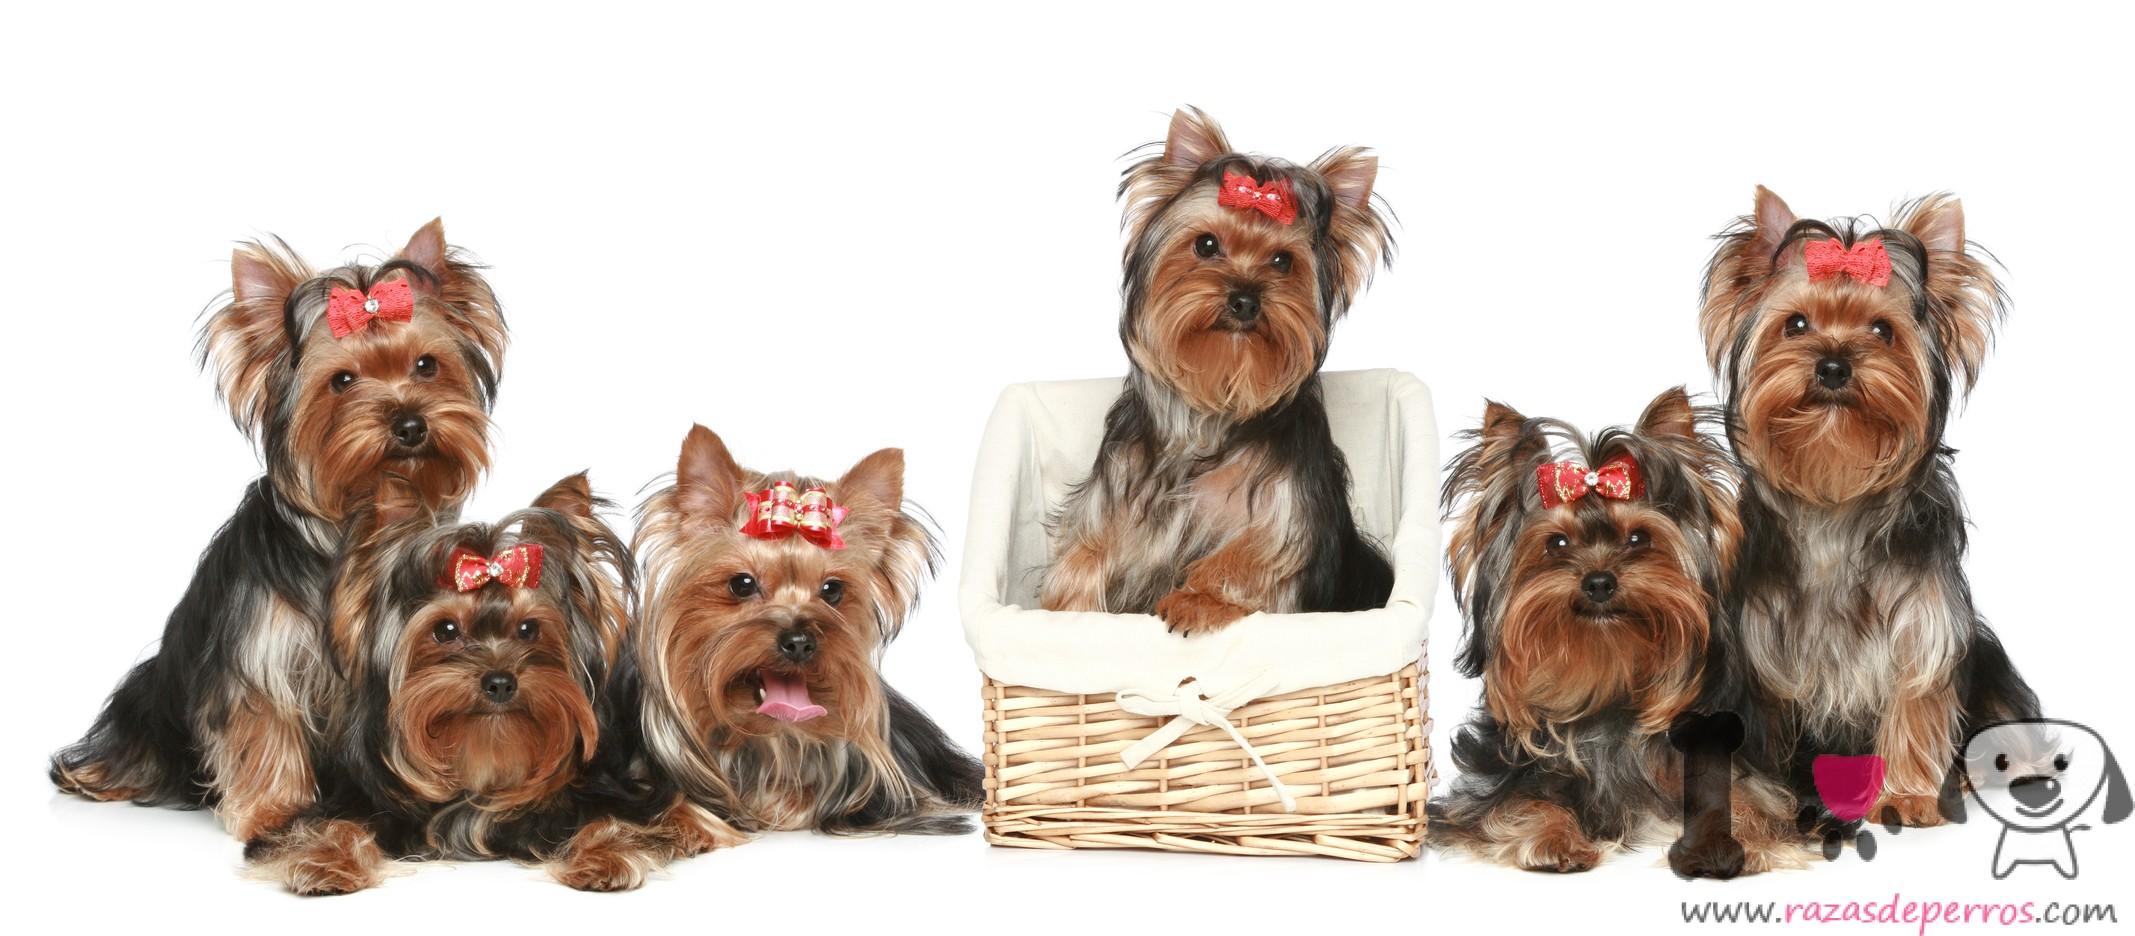 6 yorkshire terrier